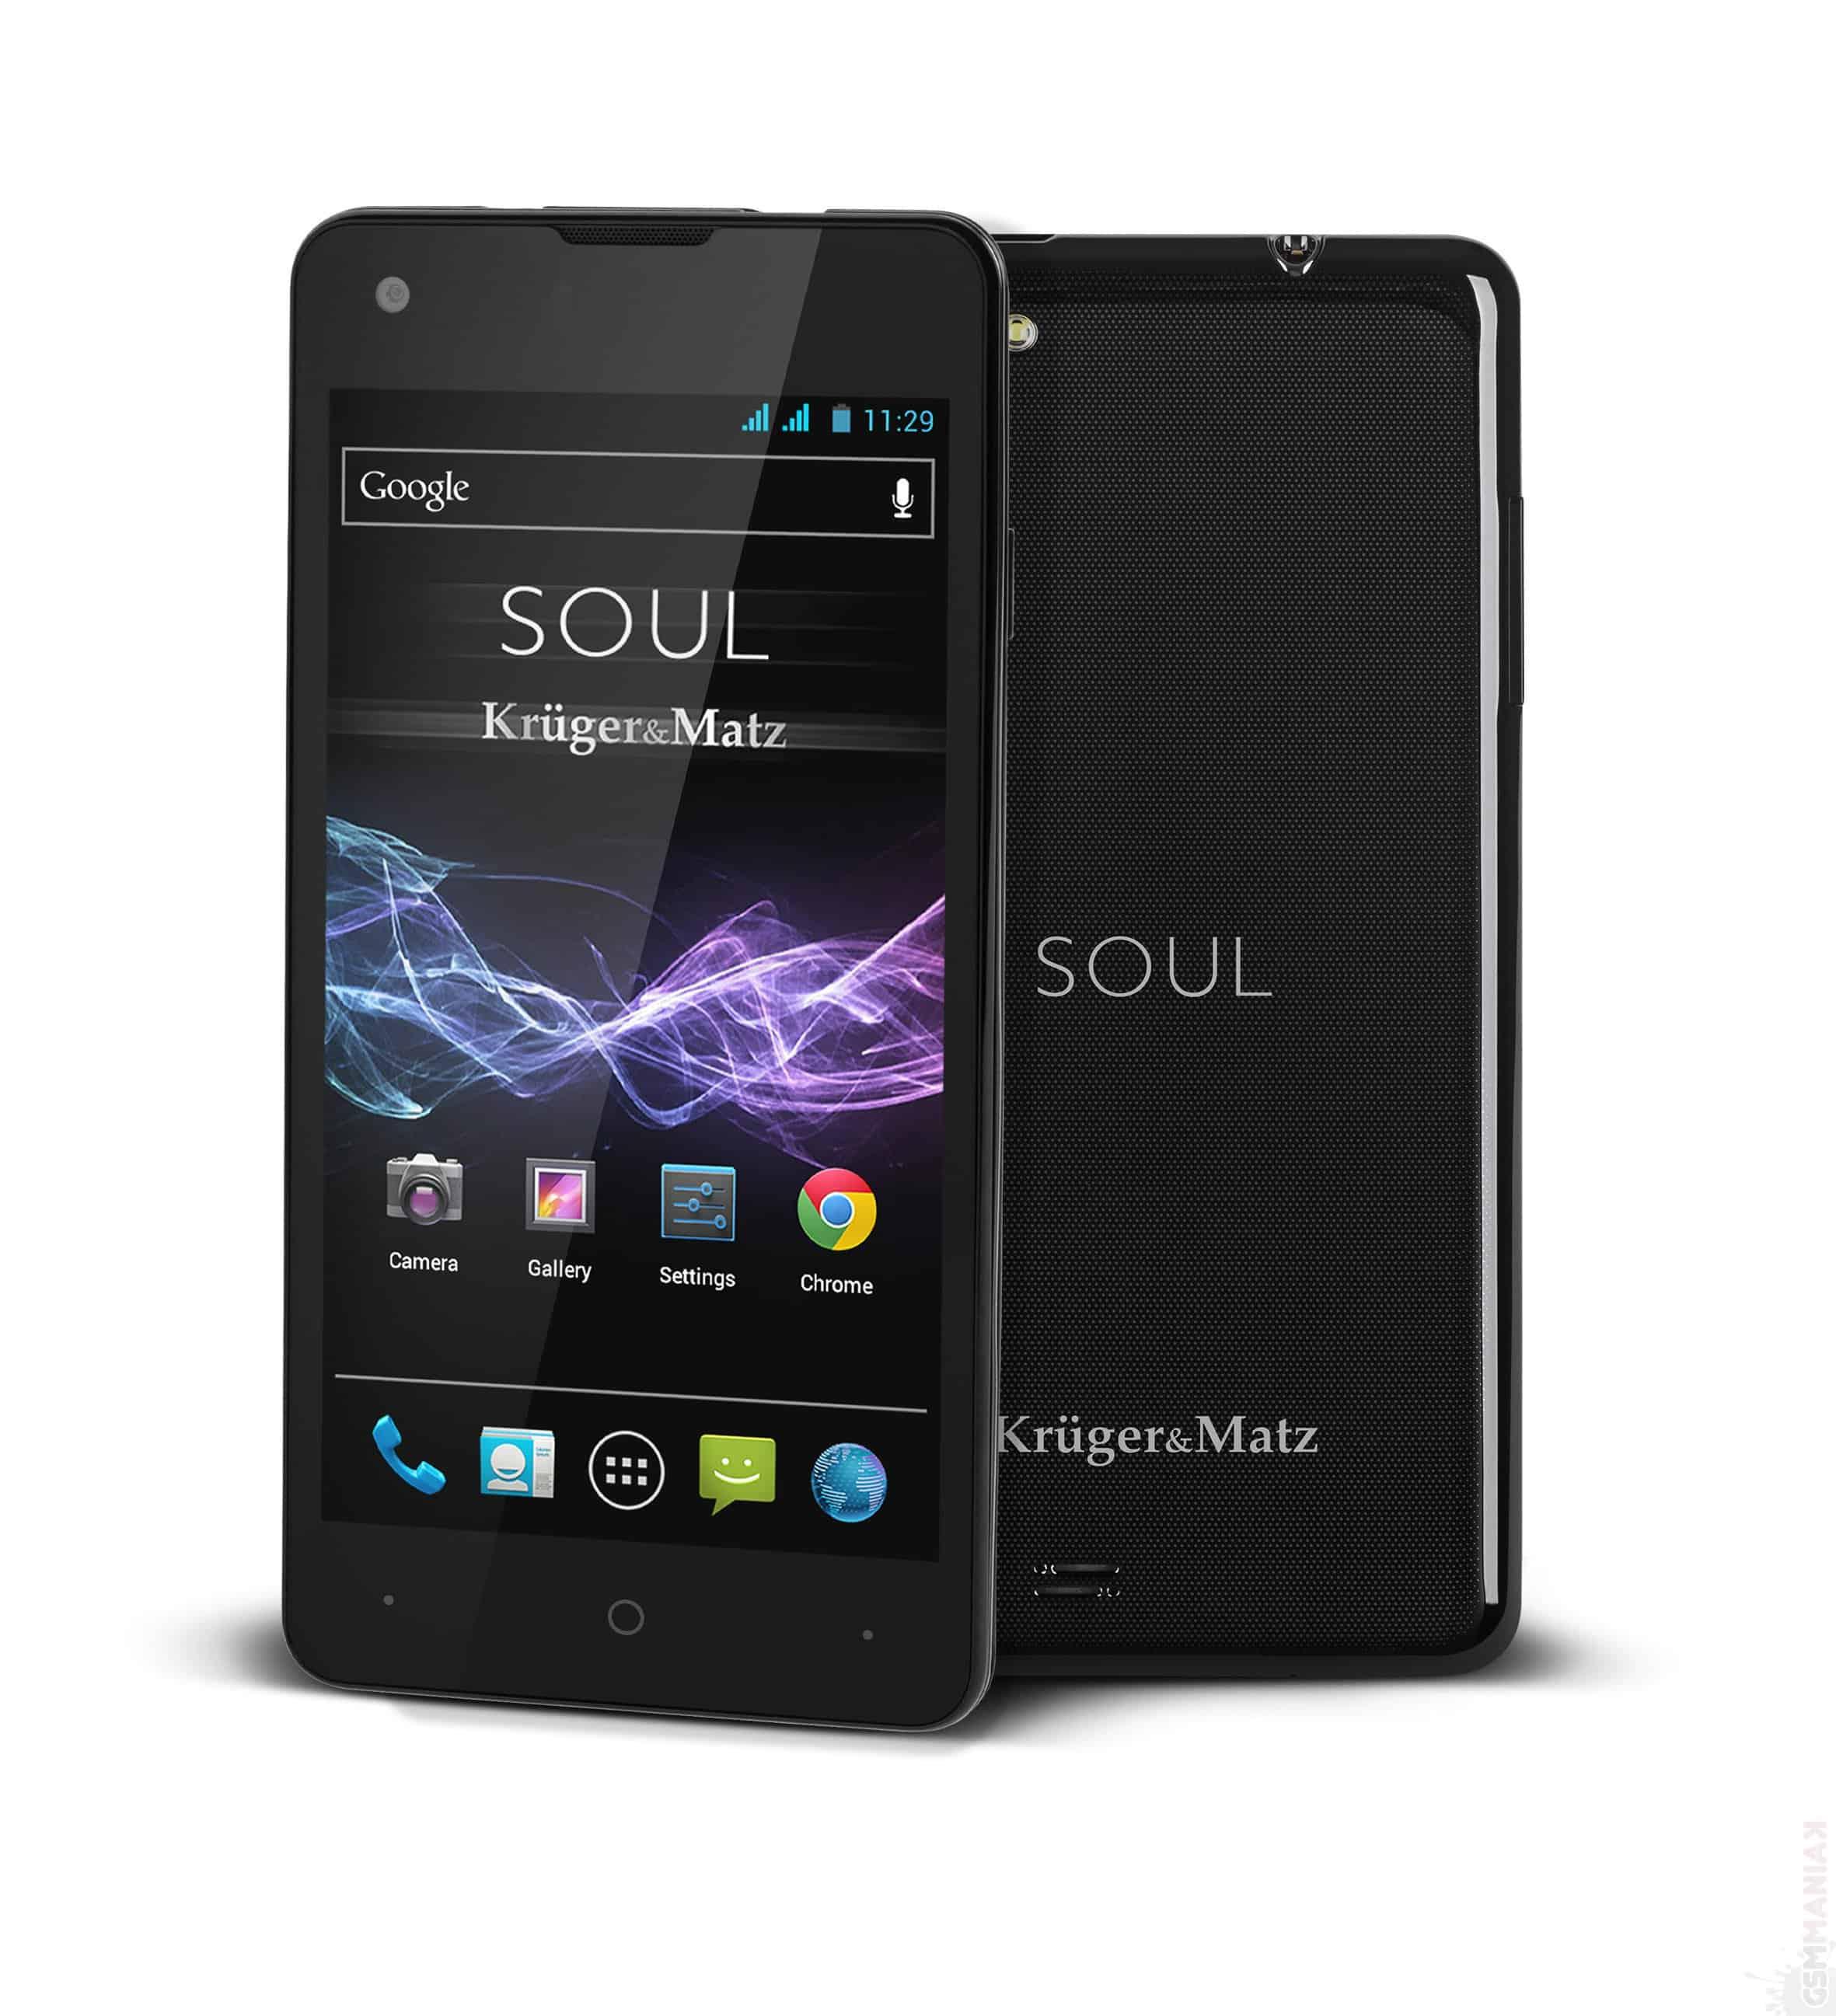 soul  Soul 2, de la Krüger&Matz, un smartphone elegant soul